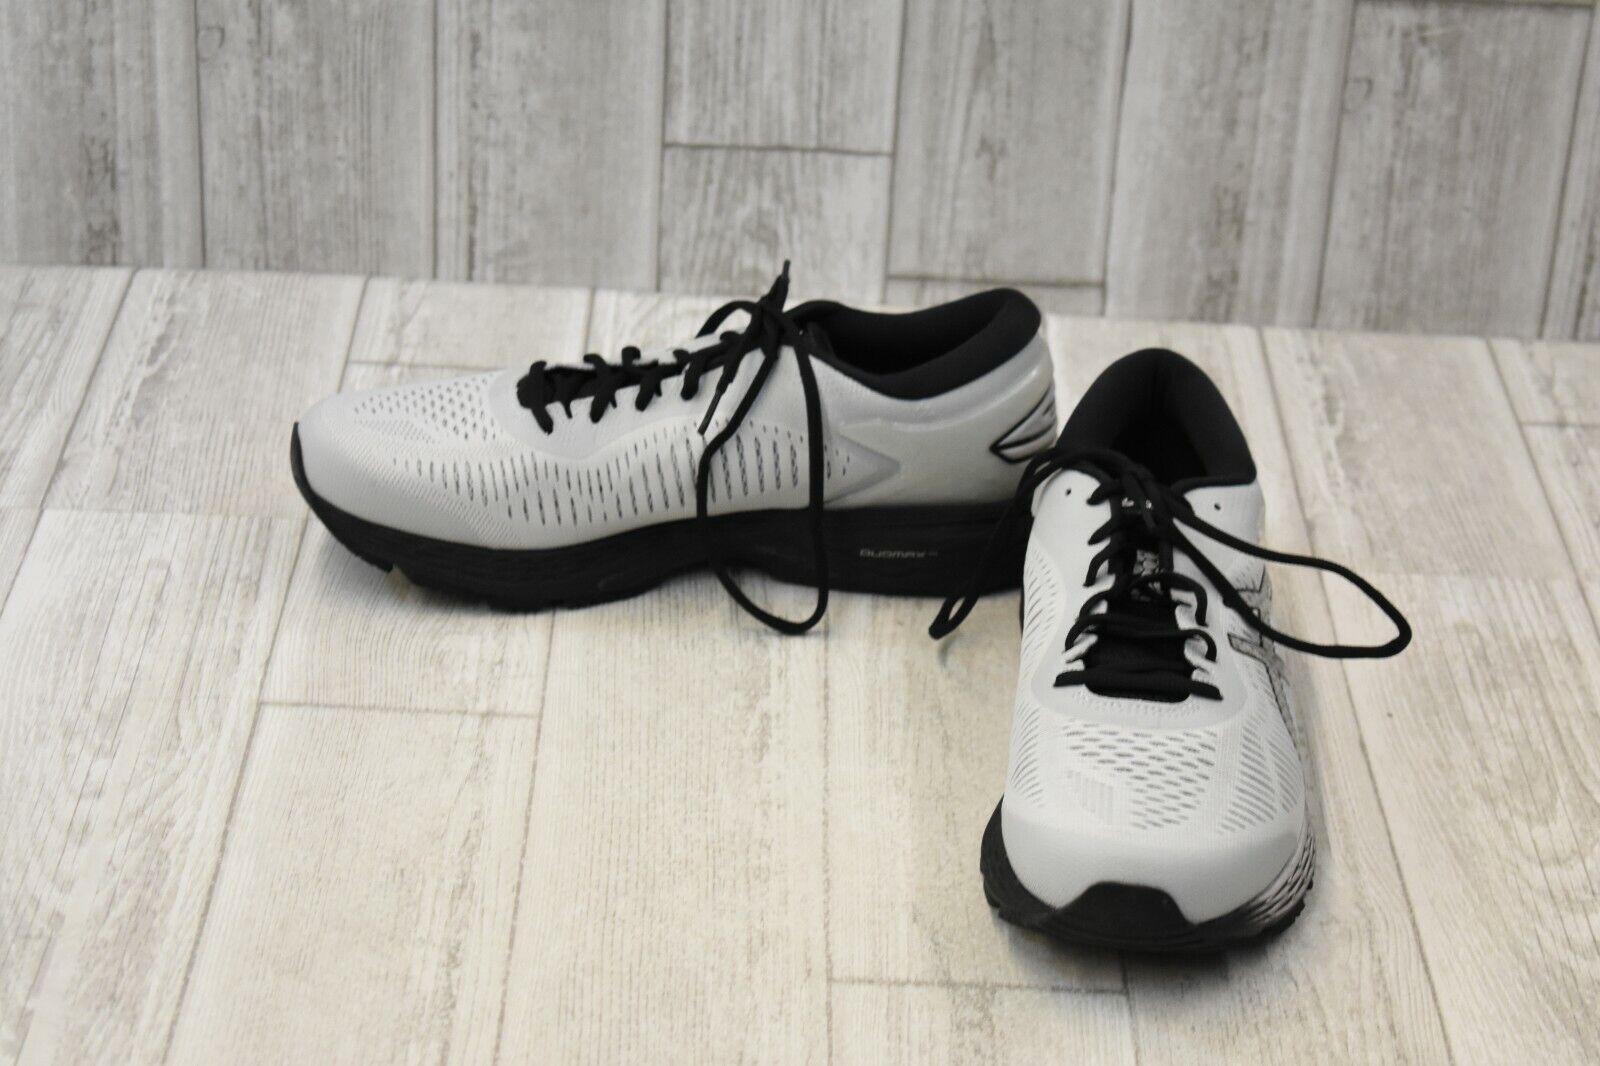 Asics Gel Keyano 25 baskets-Homme Taille 11, glacier gris noir